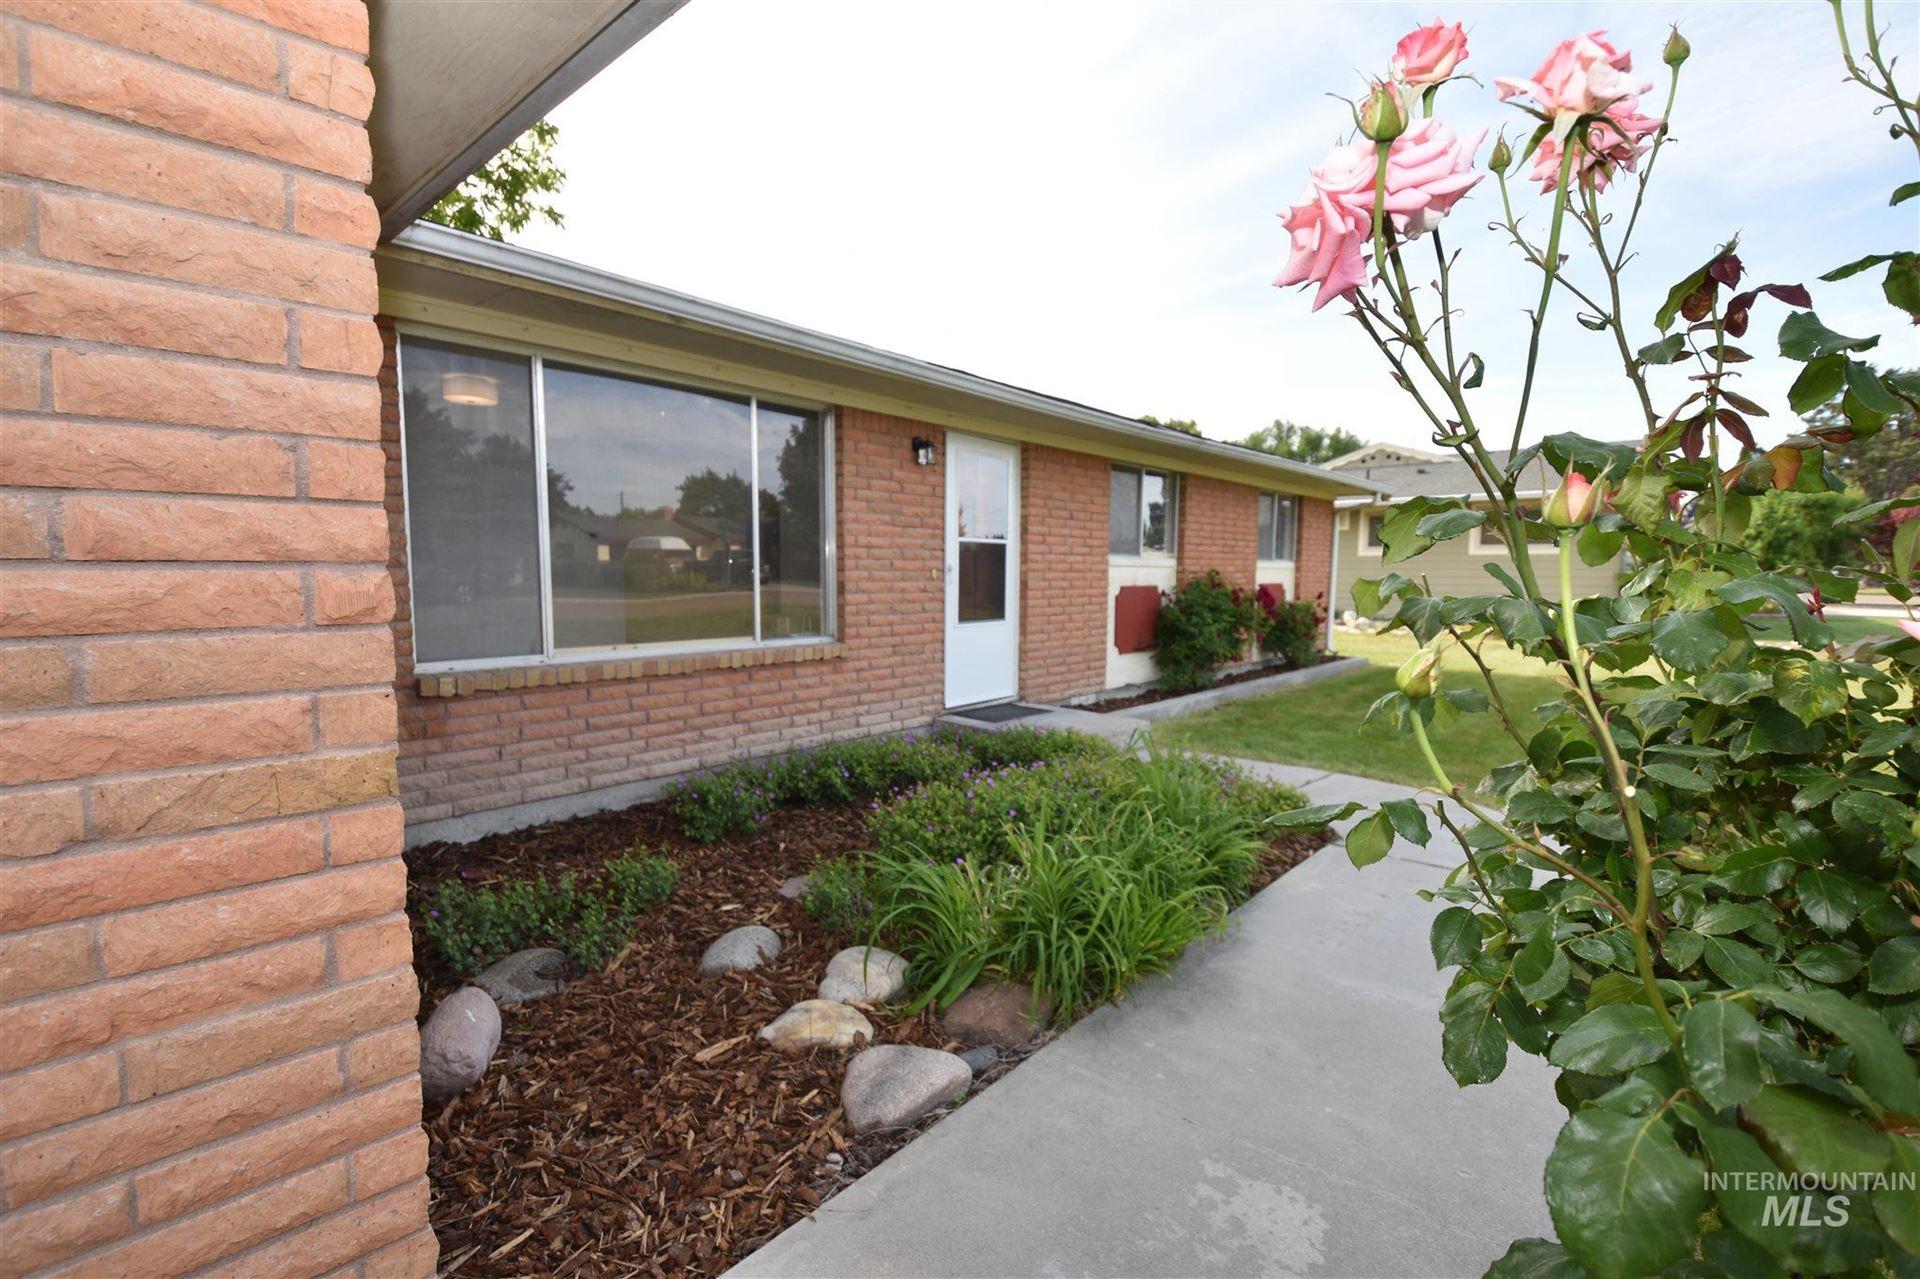 Photo of 3308 Iowa Ave, Caldwell, ID 83605 (MLS # 98806532)